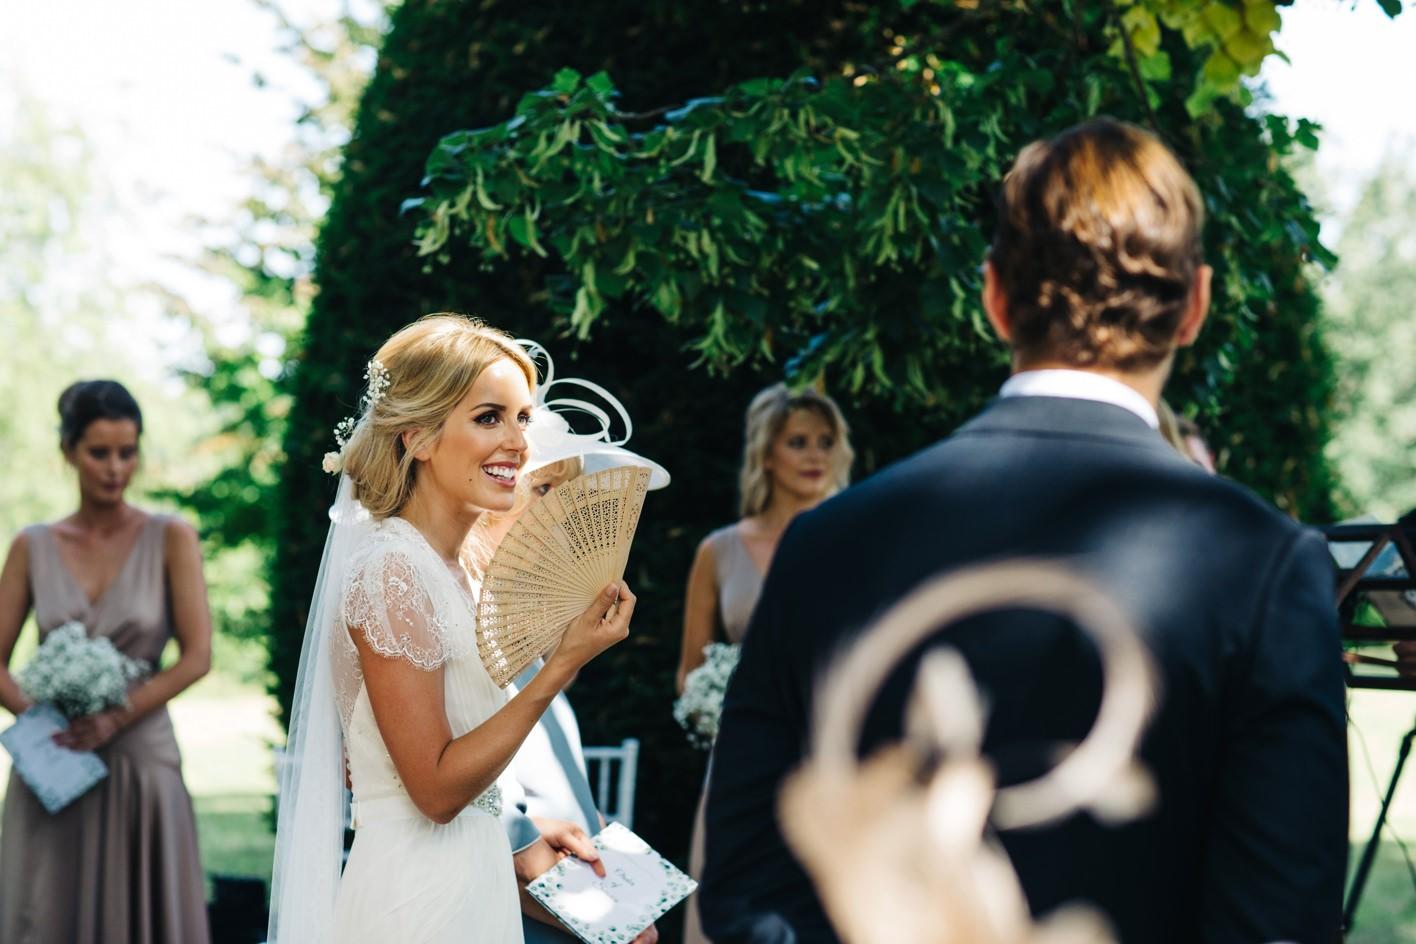 bride glancing at her future husband